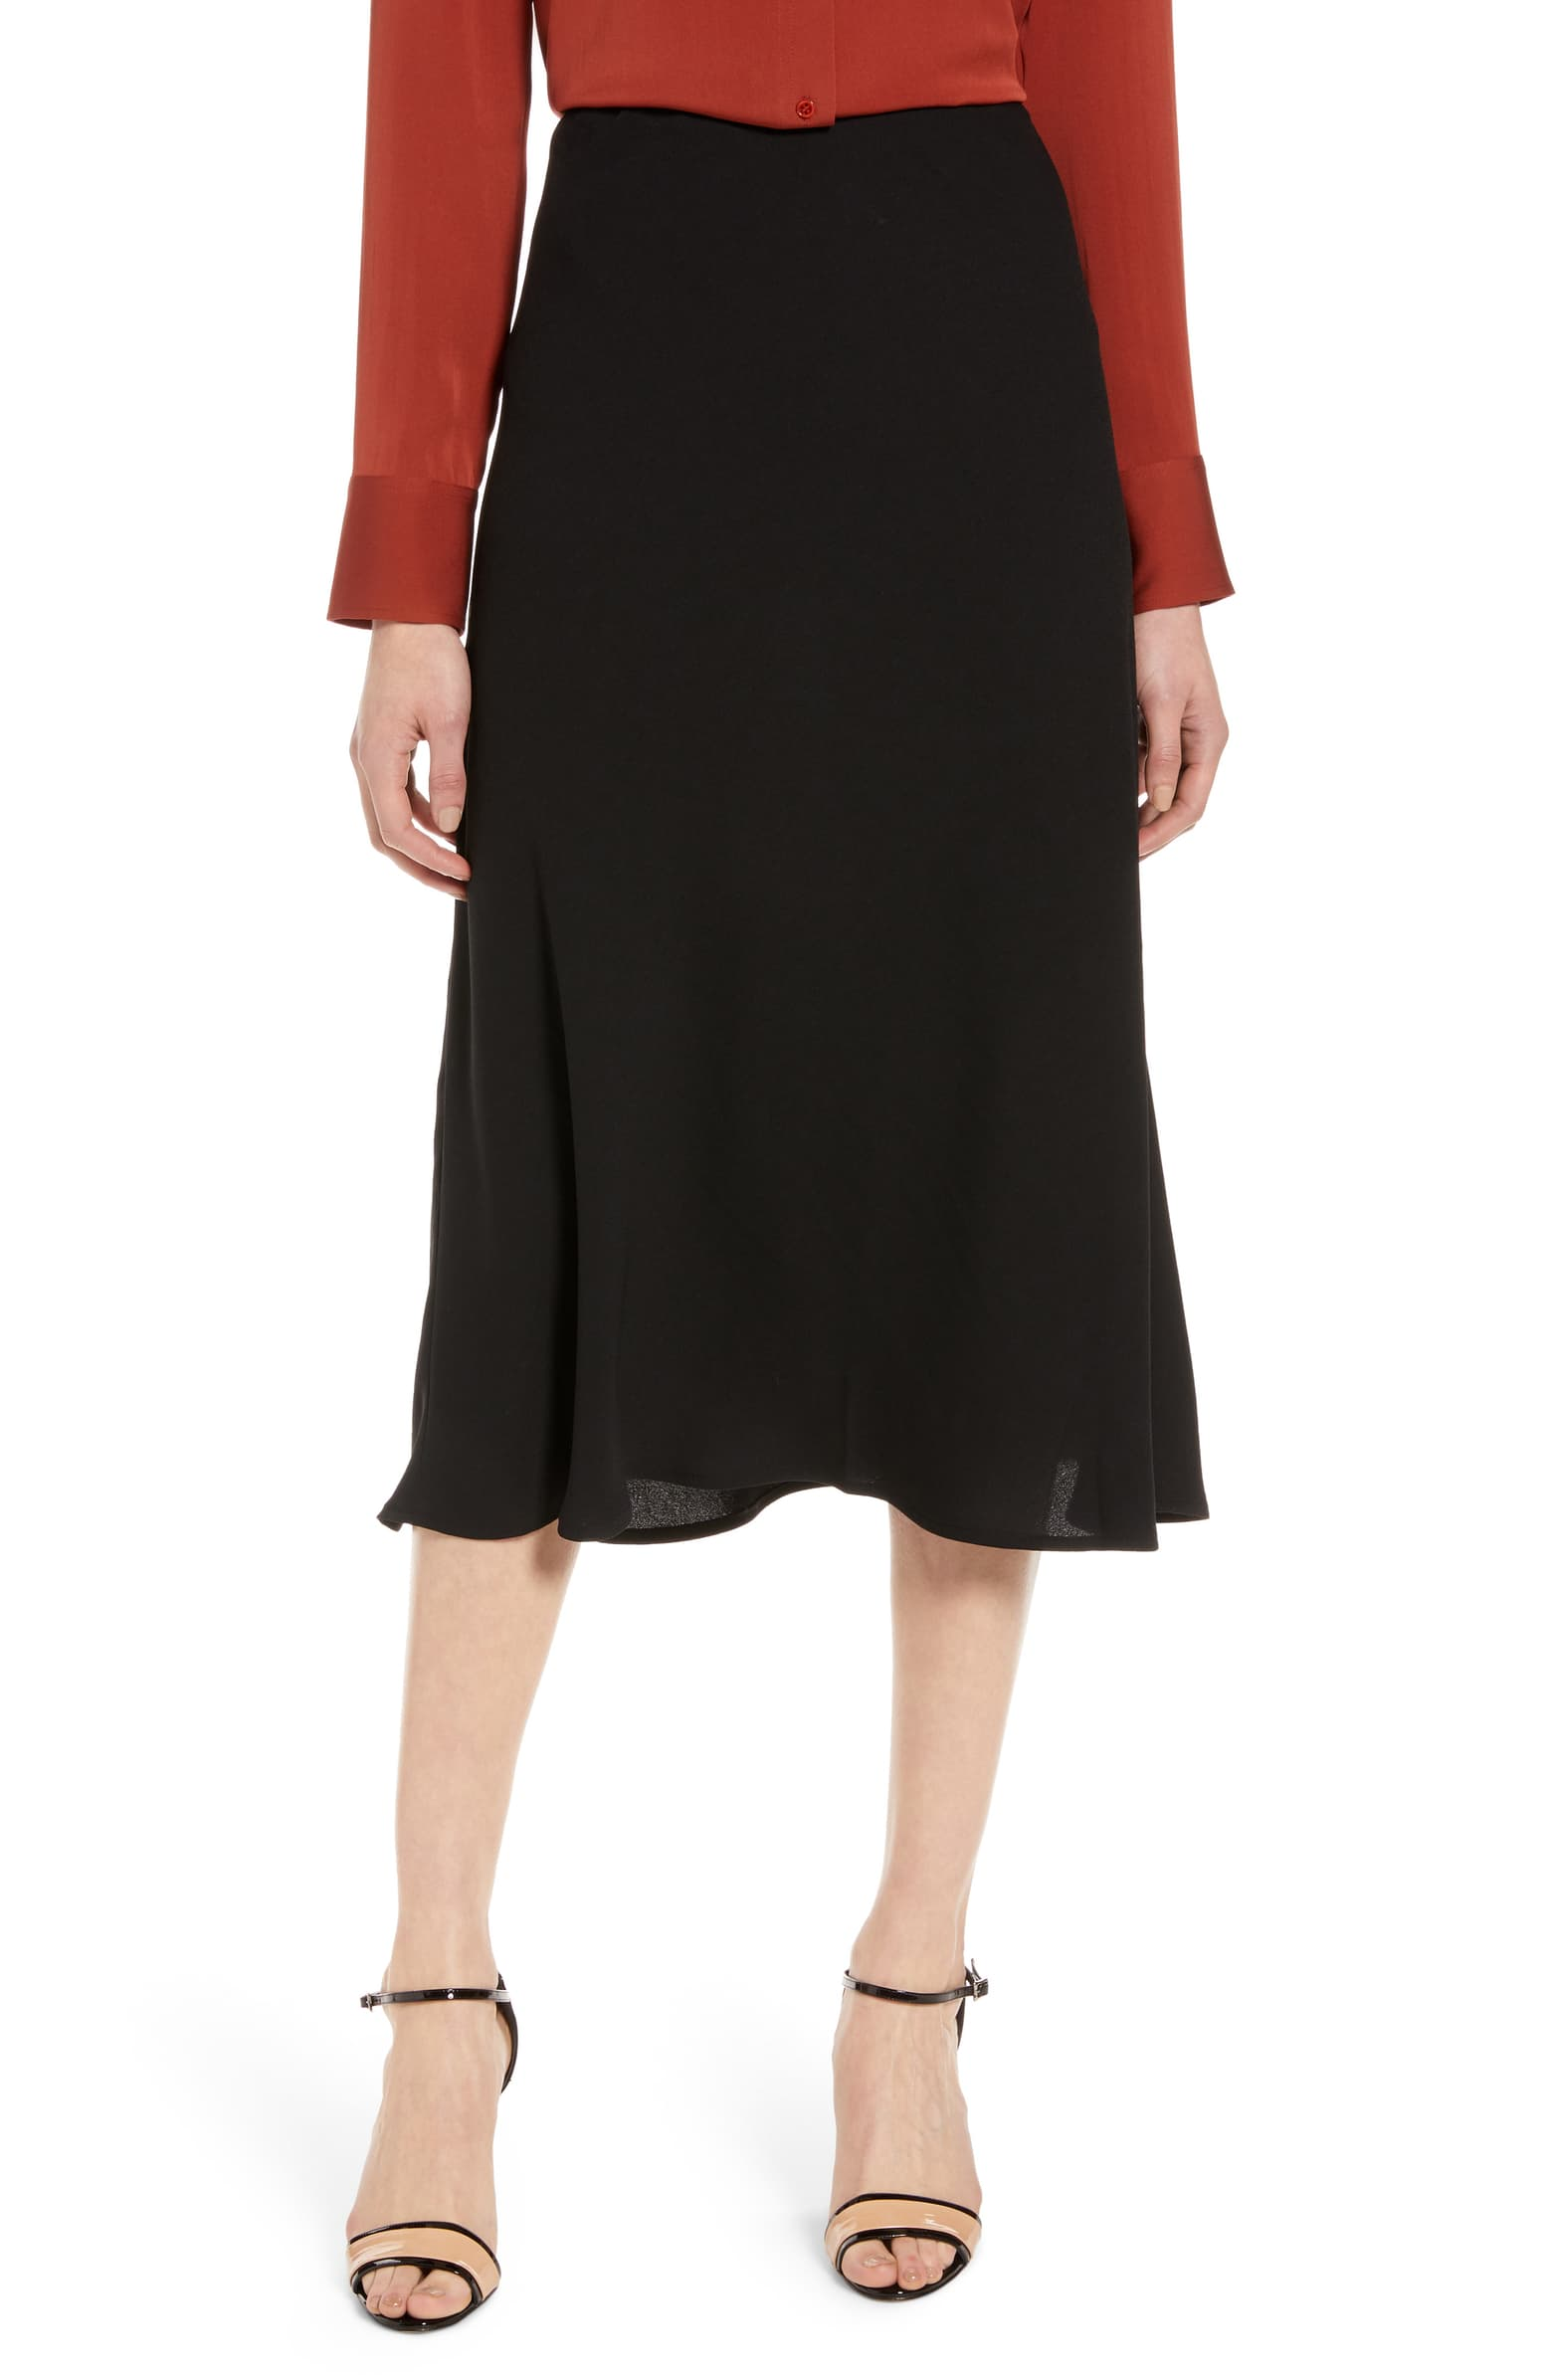 Bias Cut A Line Skirt by Halogen